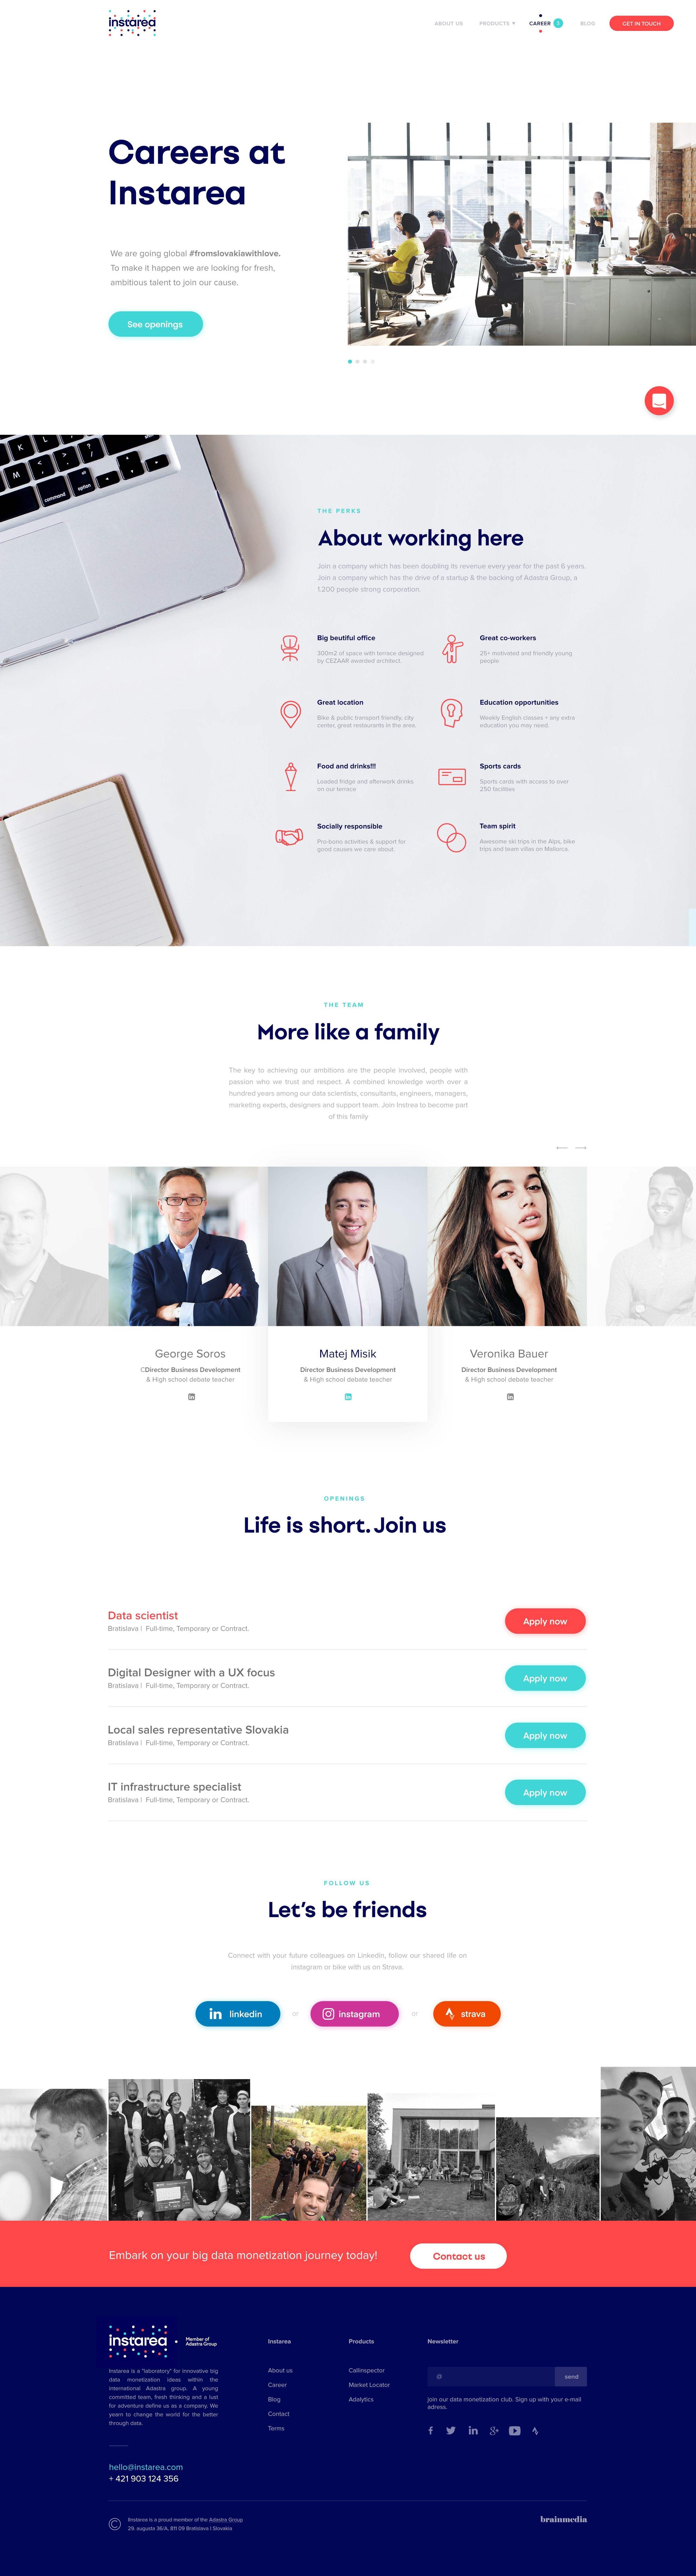 Instarea Career Web Design Jobs Website Design Inspiration Webpage Design